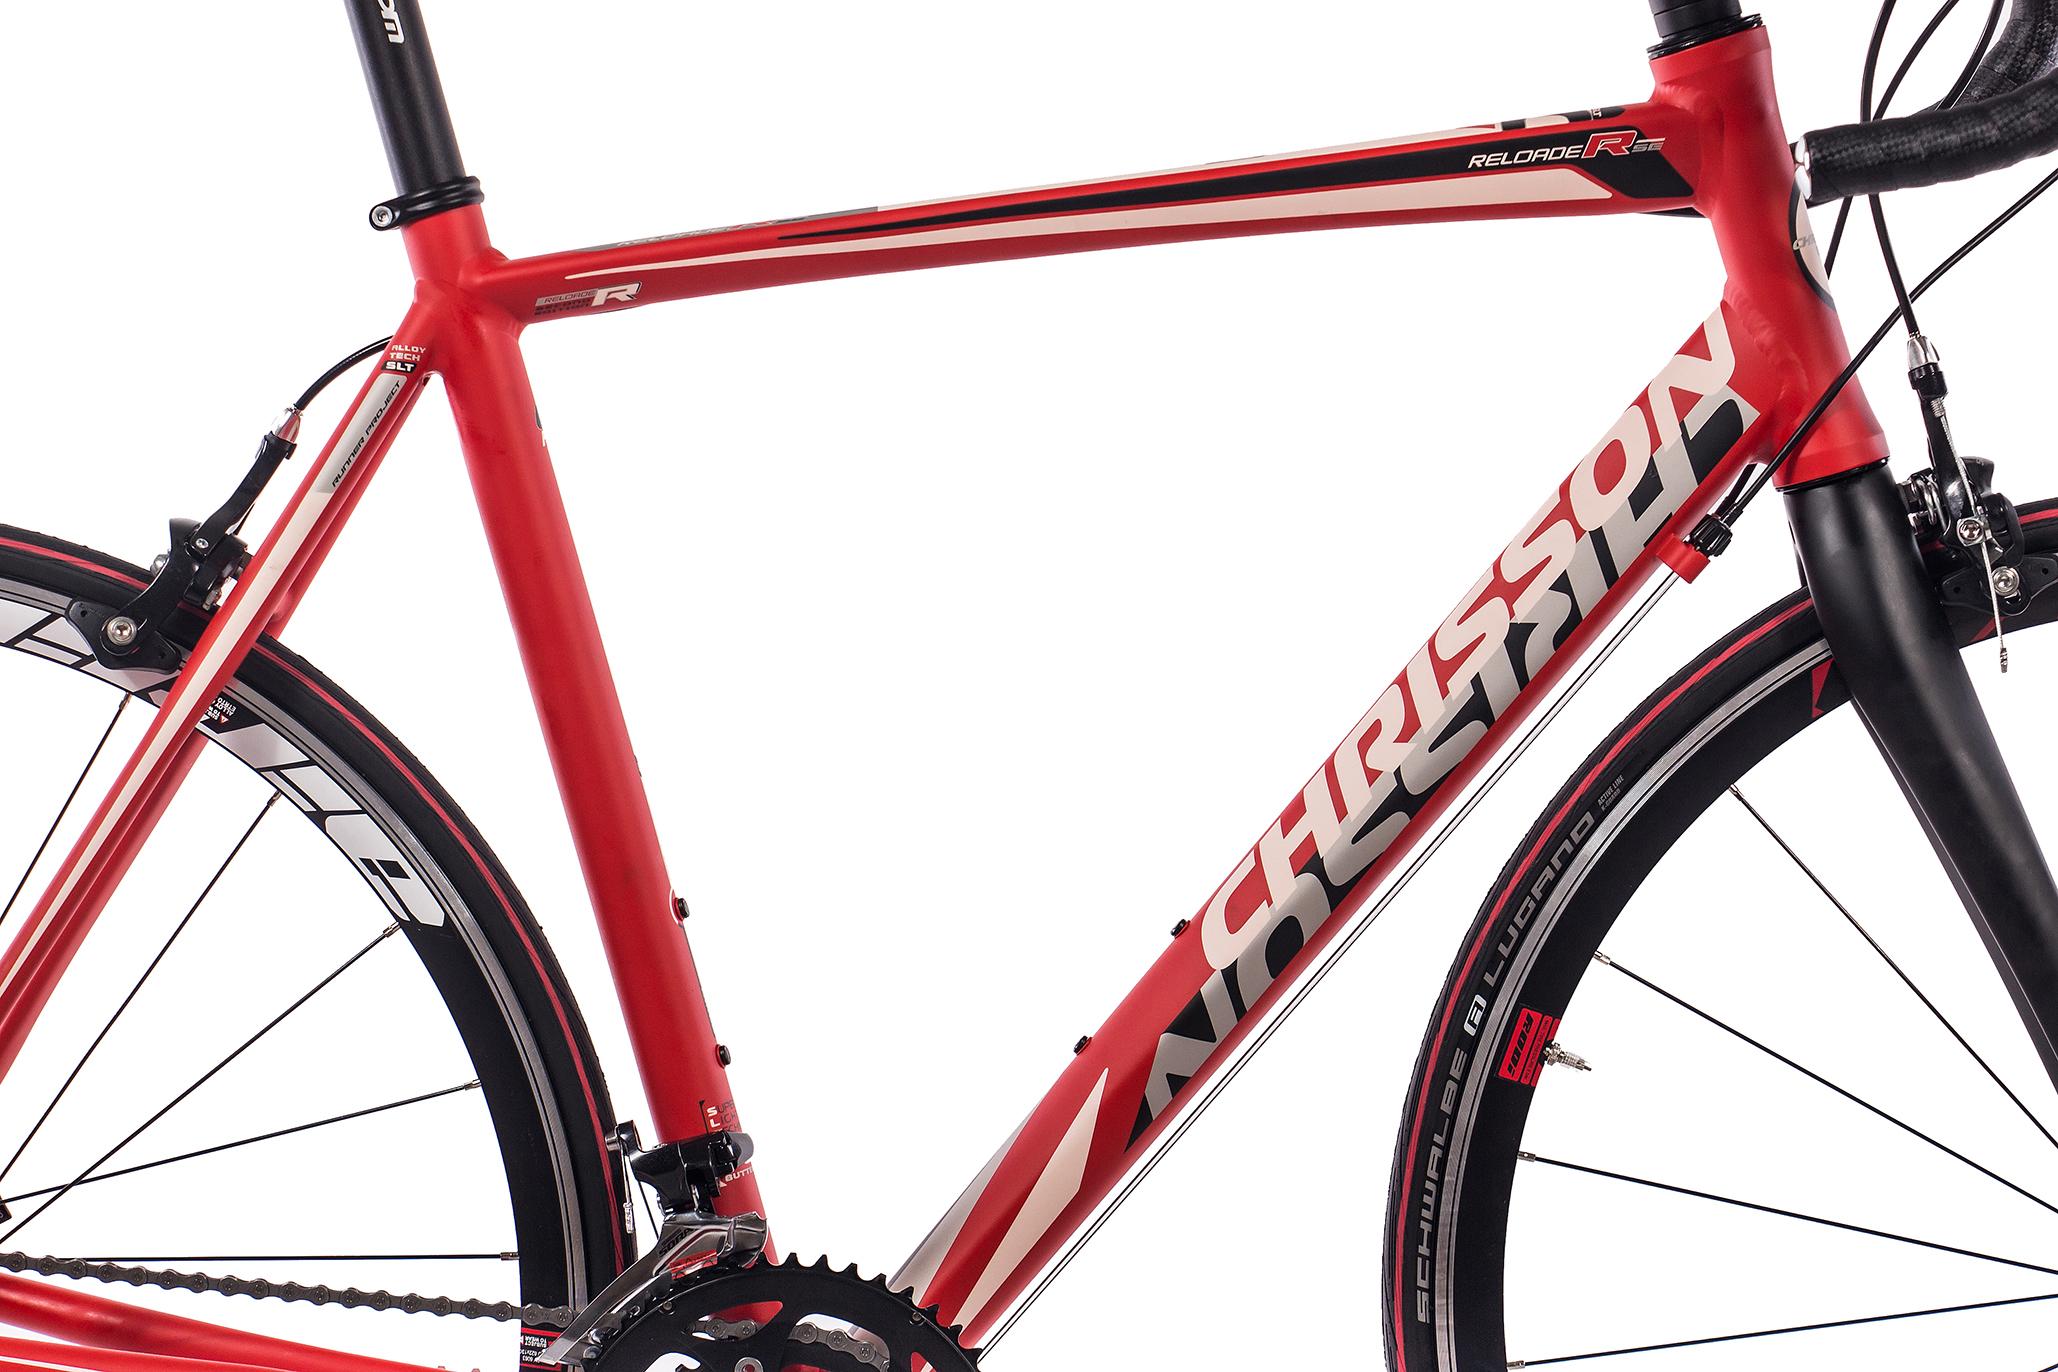 28-034-Zoll-ALU-Rennrad-Fahrrad-CHRISSON-RELOADER-mit-18G-SORA-CARBONGABEL-rot Indexbild 23